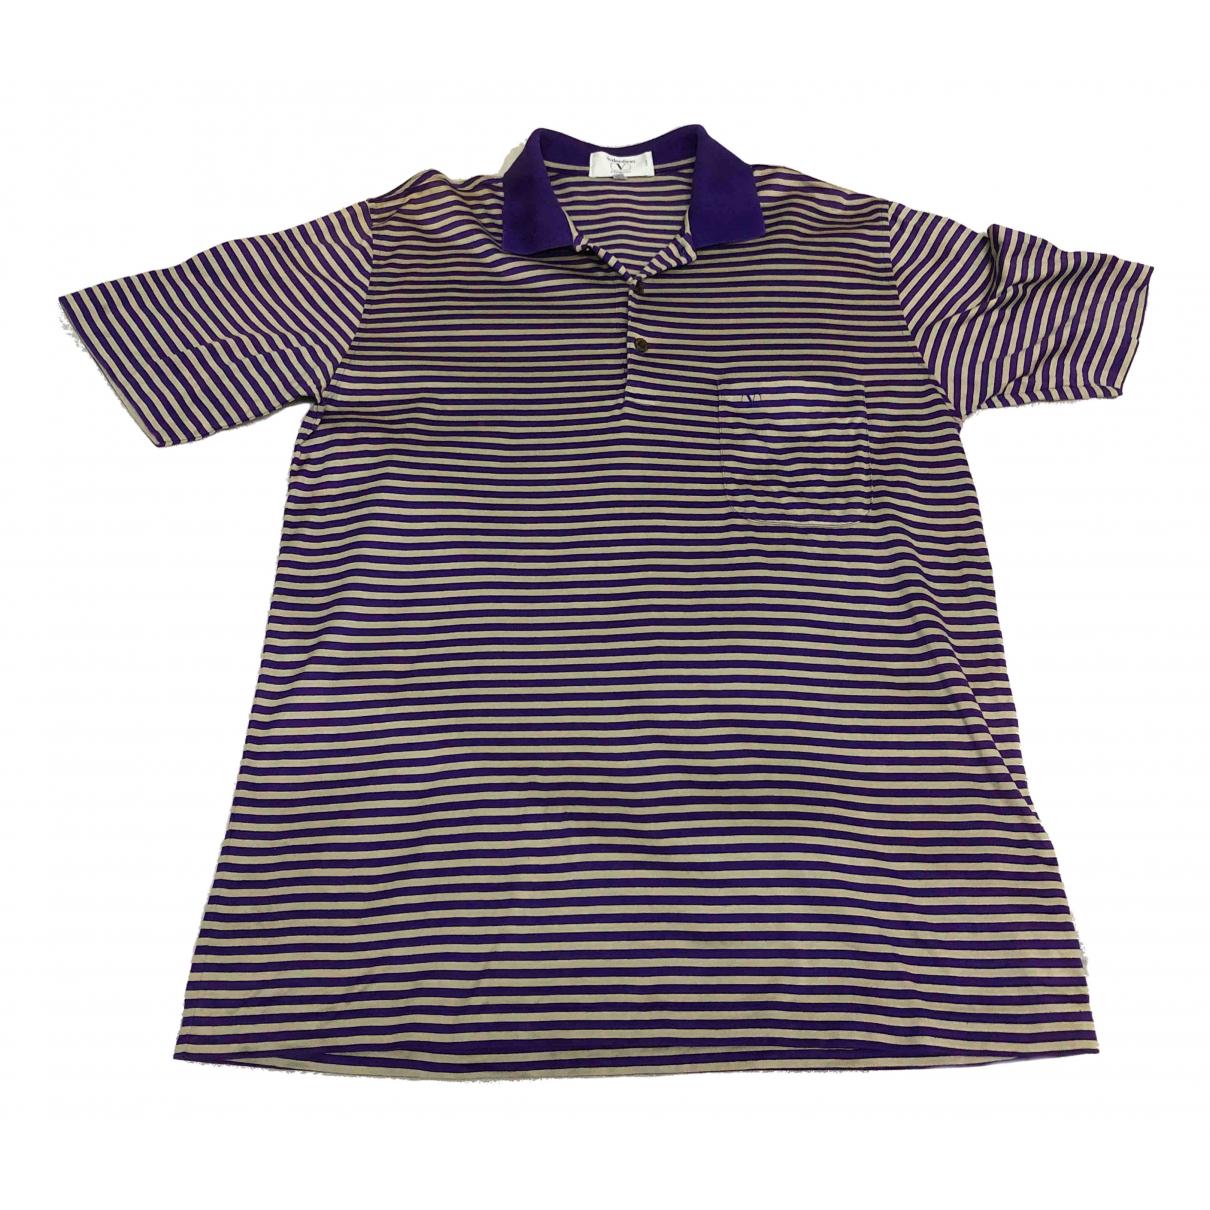 Valentino Garavani \N Purple Polo shirts for Men M International